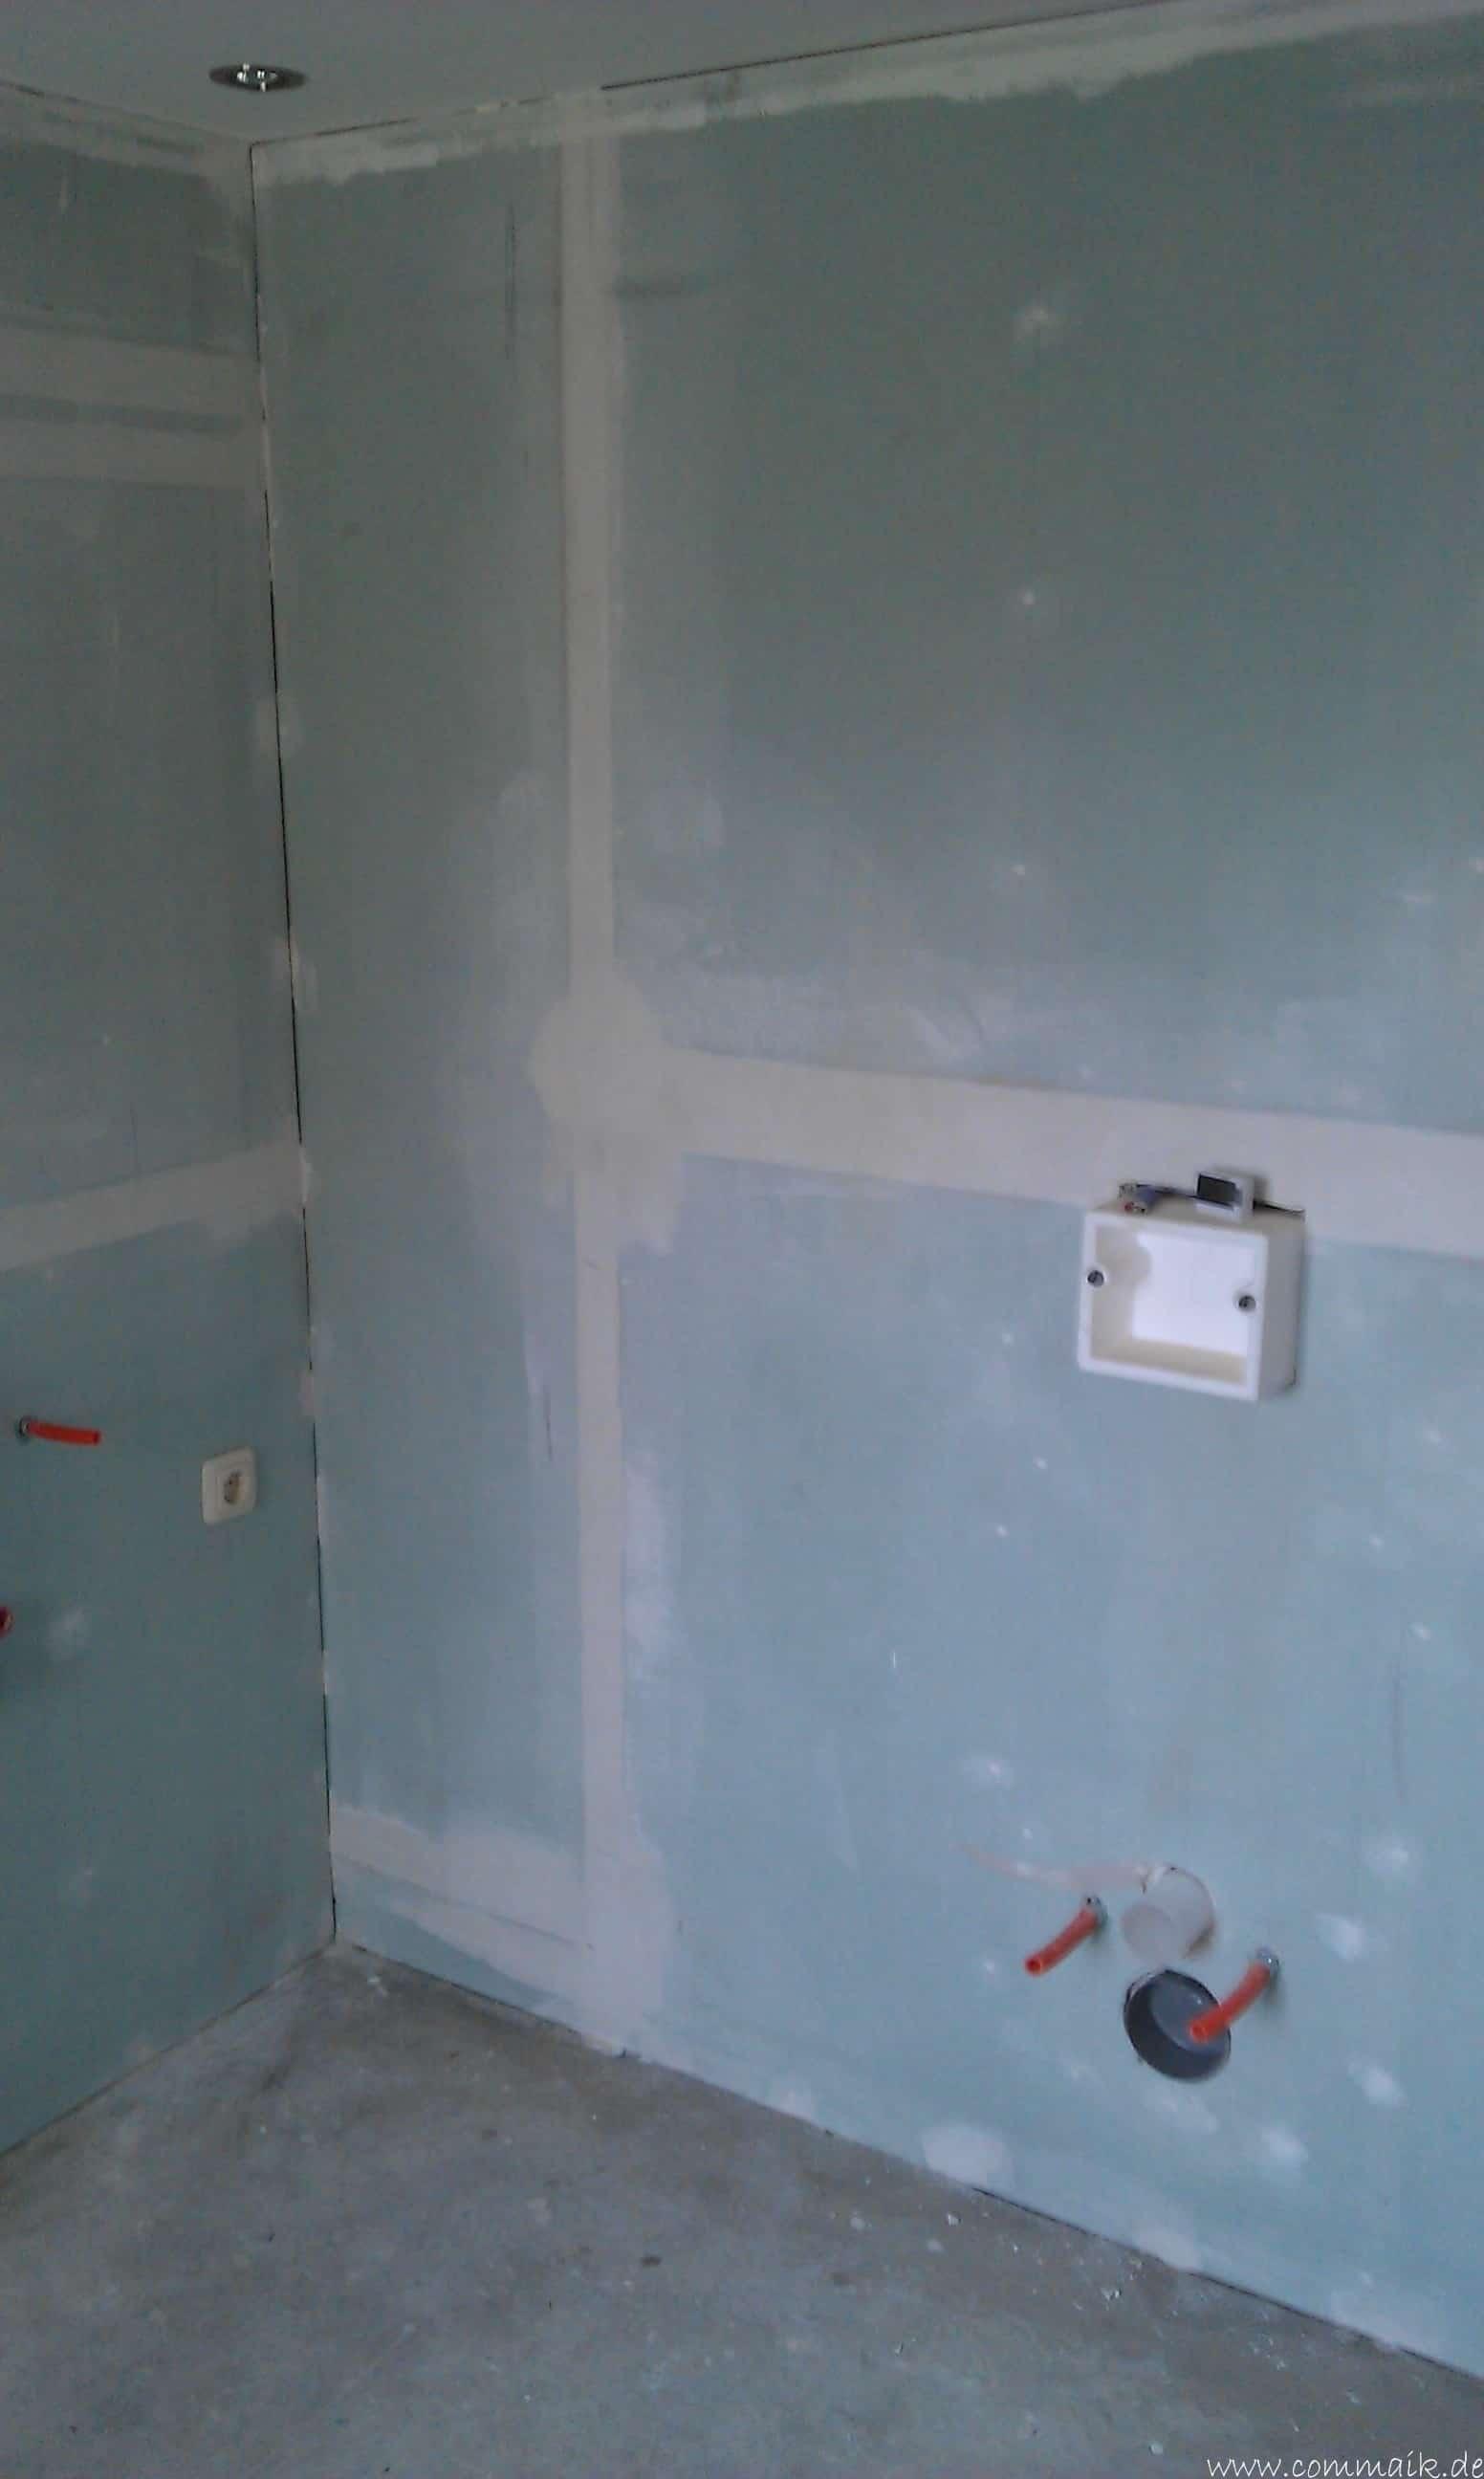 dusche im keller bauen buero im keller bauen37 - Dusche Im Keller Bauen